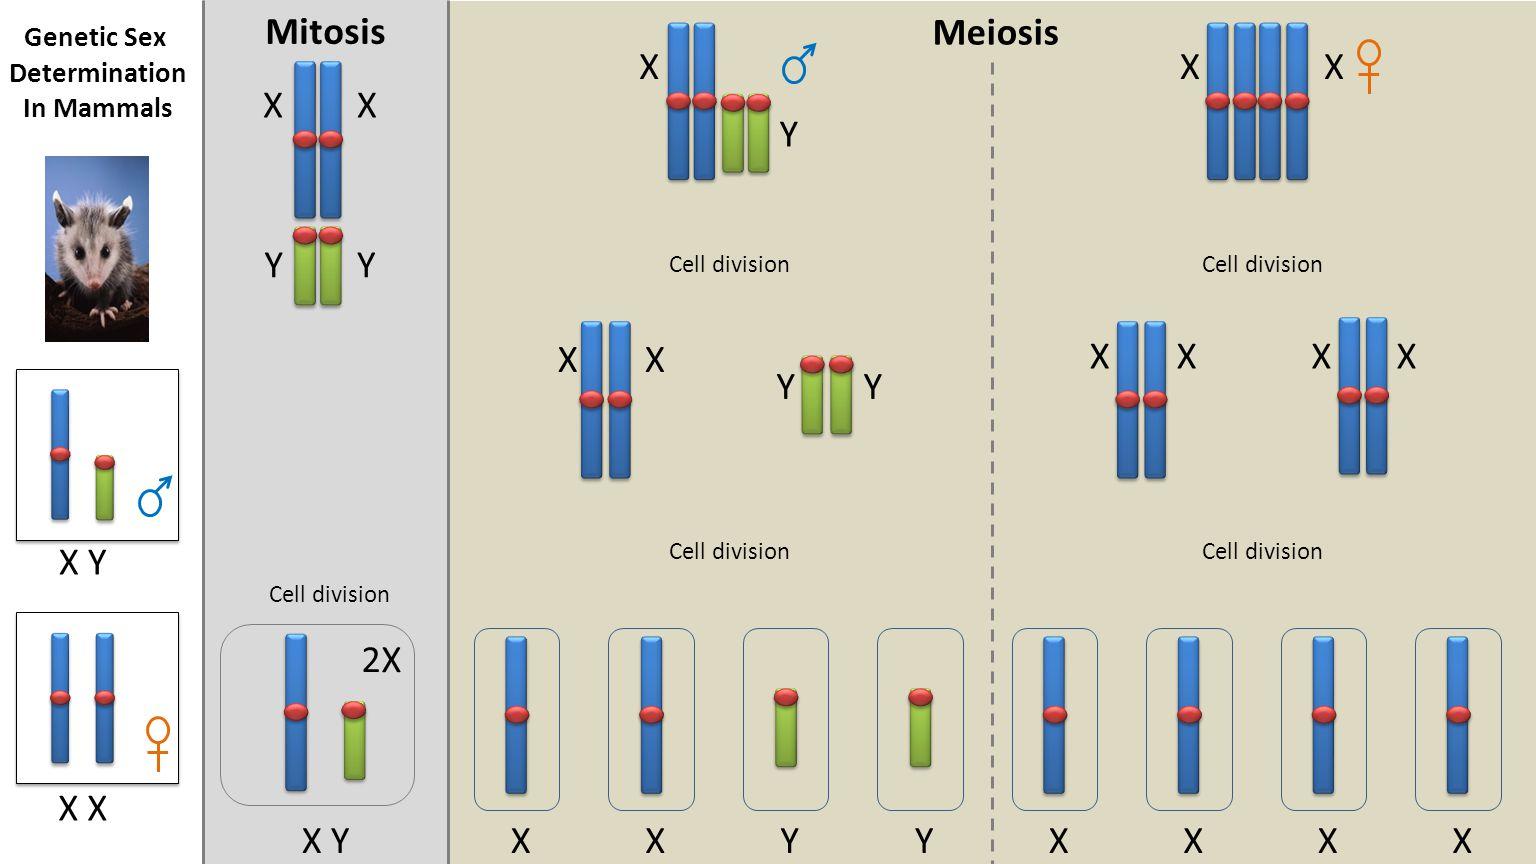 Meiosis Mitosis 2X Cell division X YXYYXXXXX XX YY X Y XX XXXX YY XX X X Y Genetic Sex Determination In Mammals